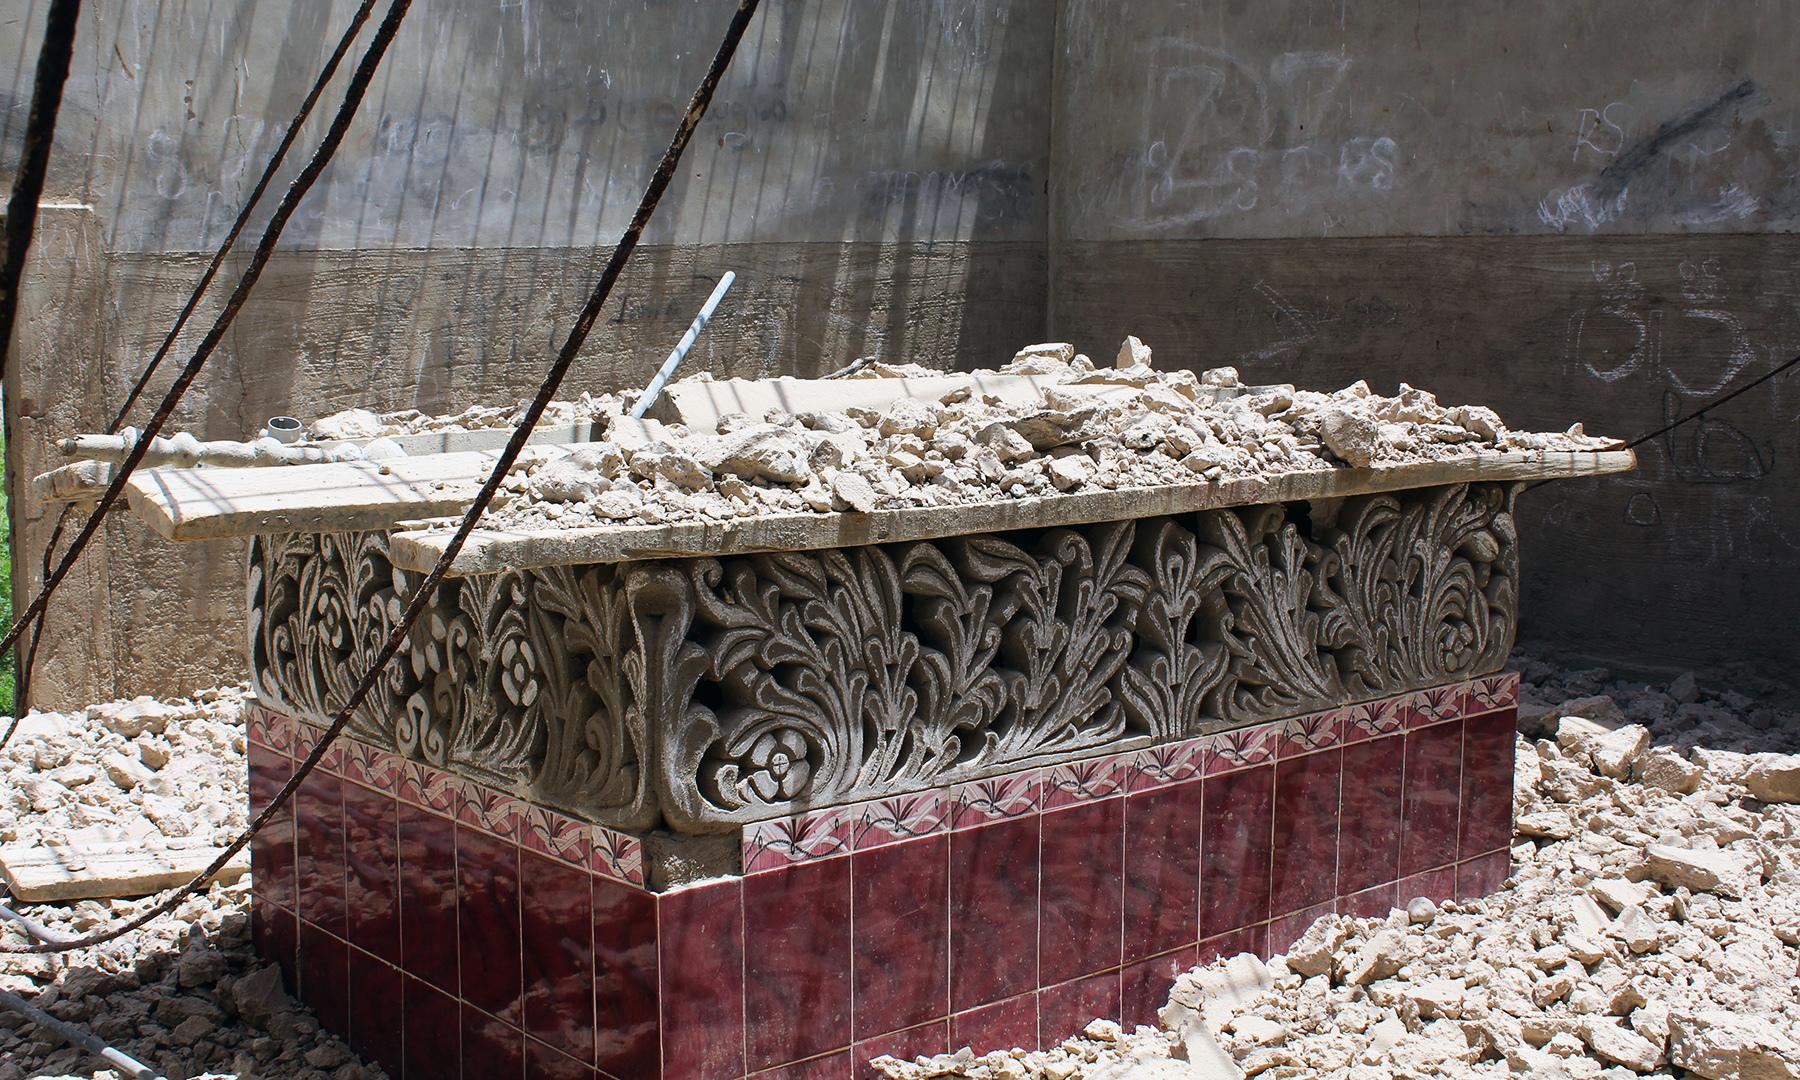 ہوش محمد عرف ہوشو شیدی کی قبر — تصویر اختر حفیظ